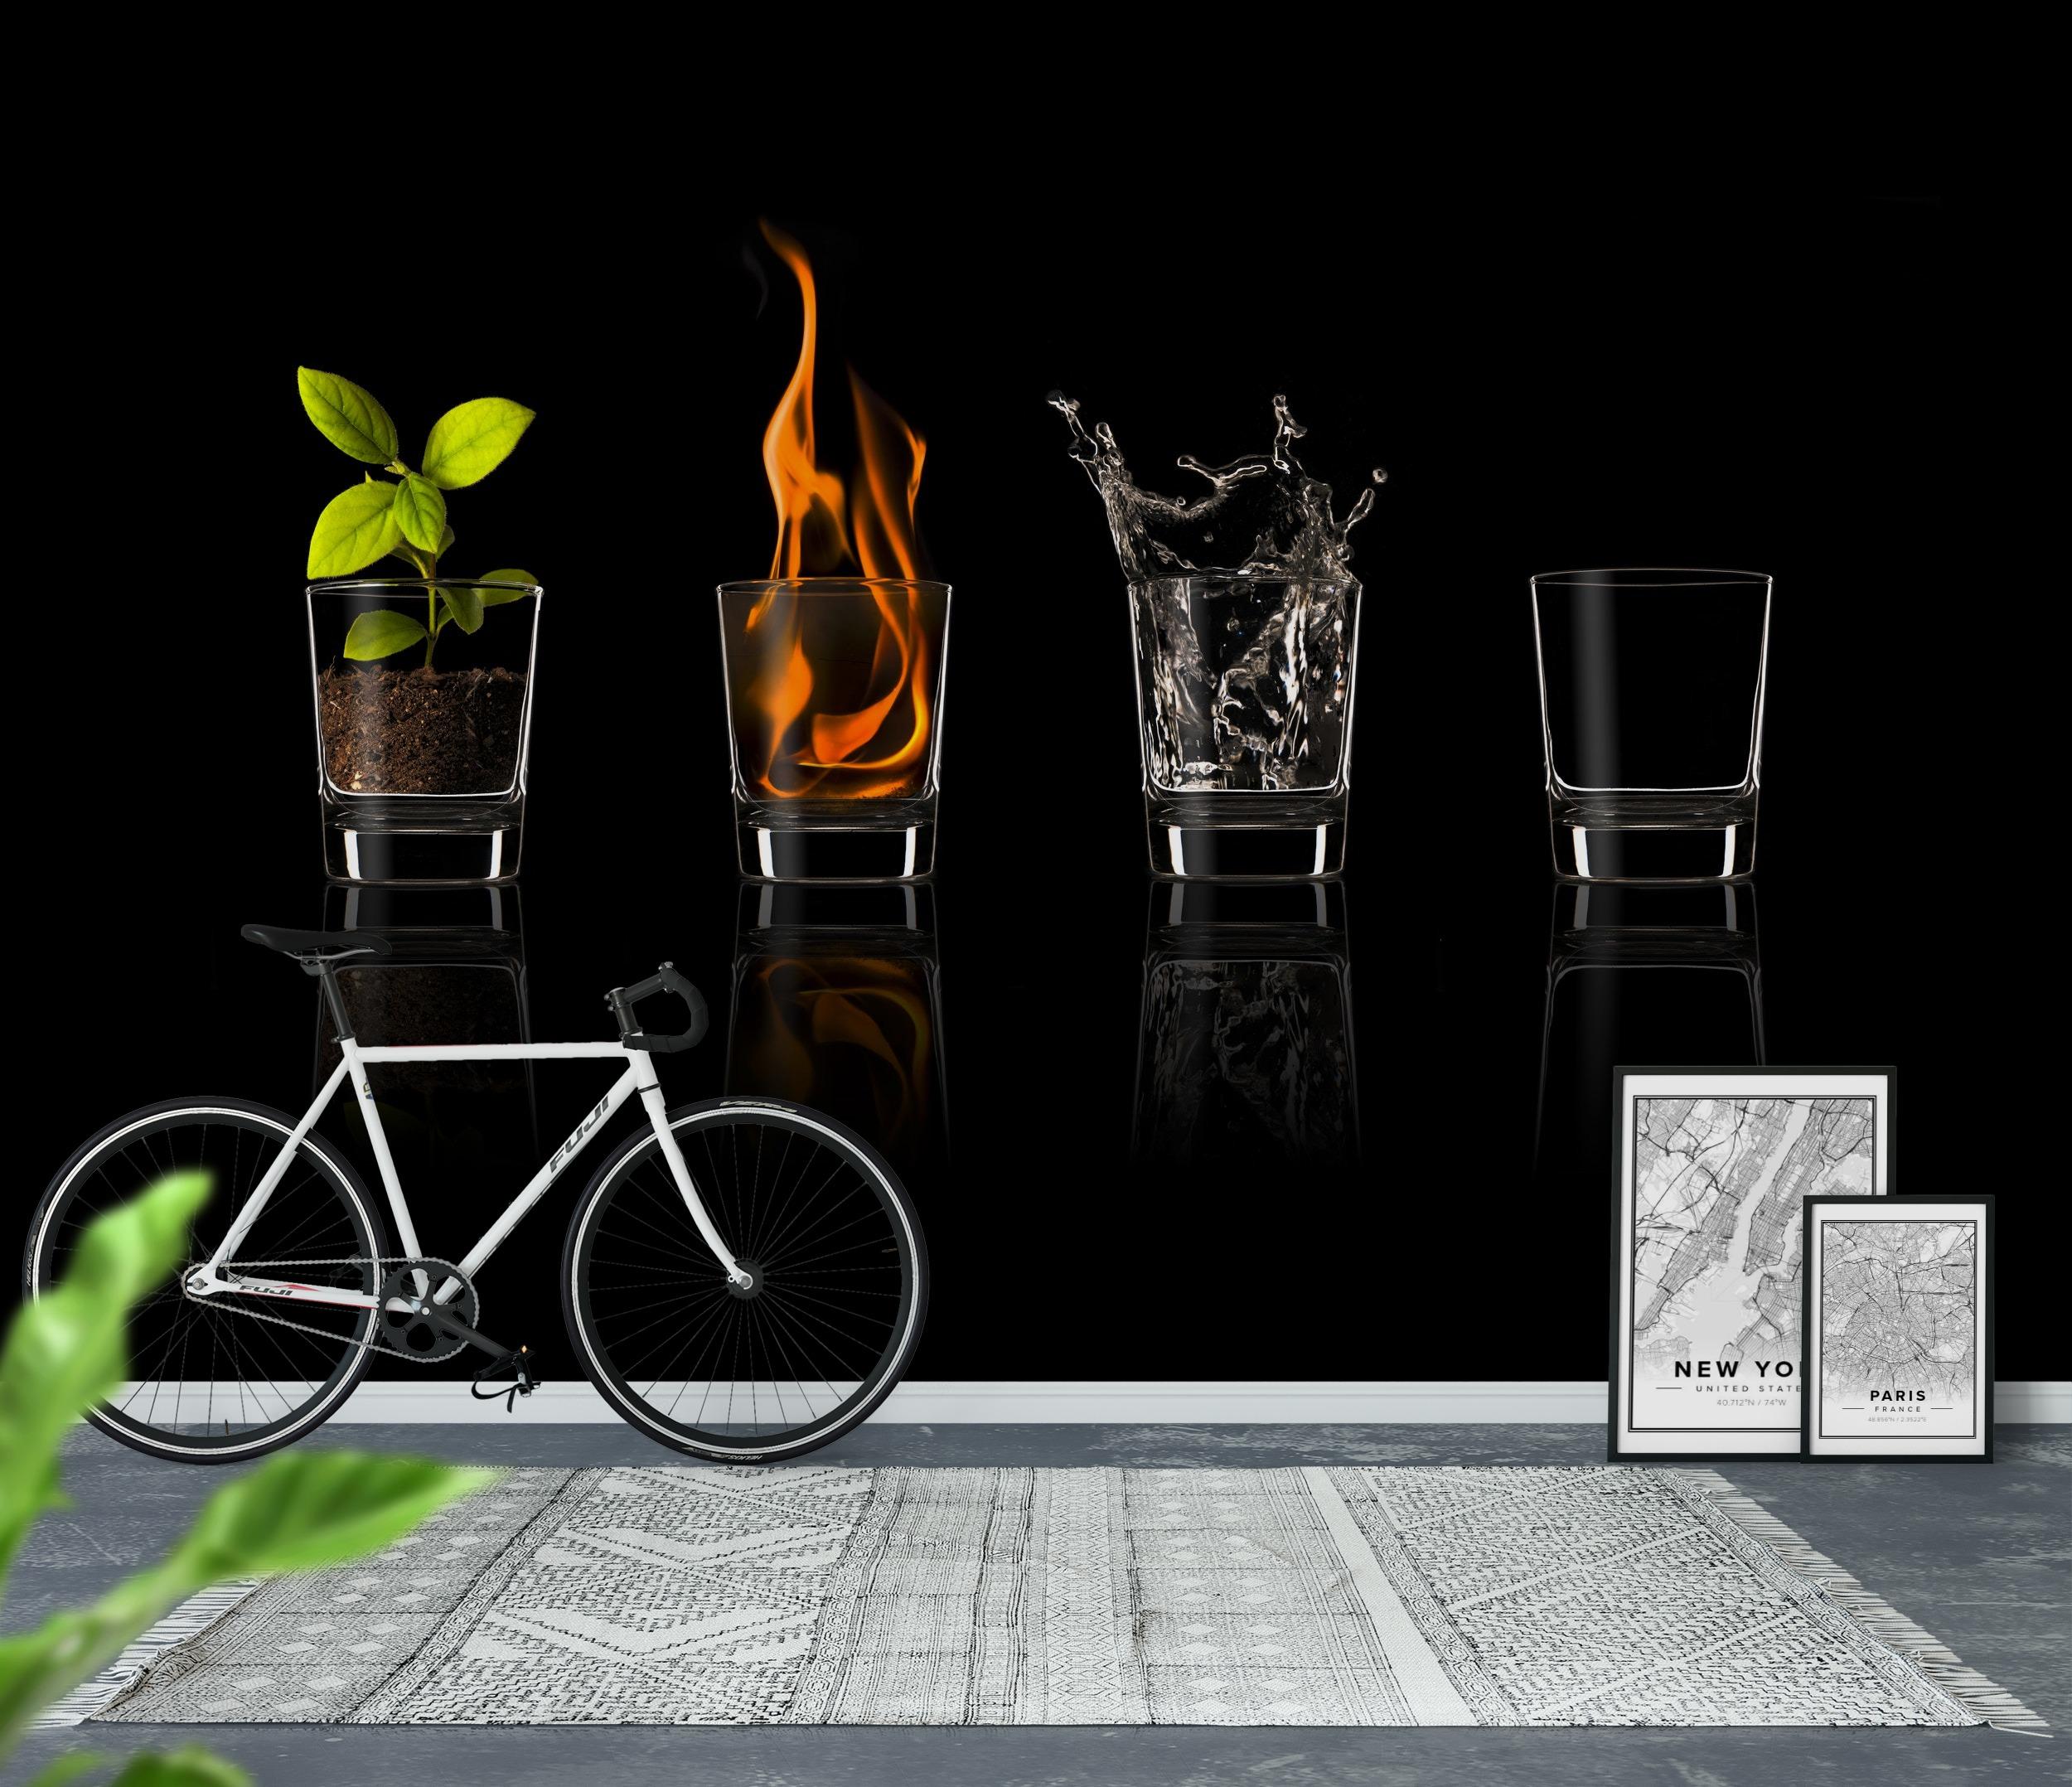 wall mural elements photo wallpaper happywall. Black Bedroom Furniture Sets. Home Design Ideas